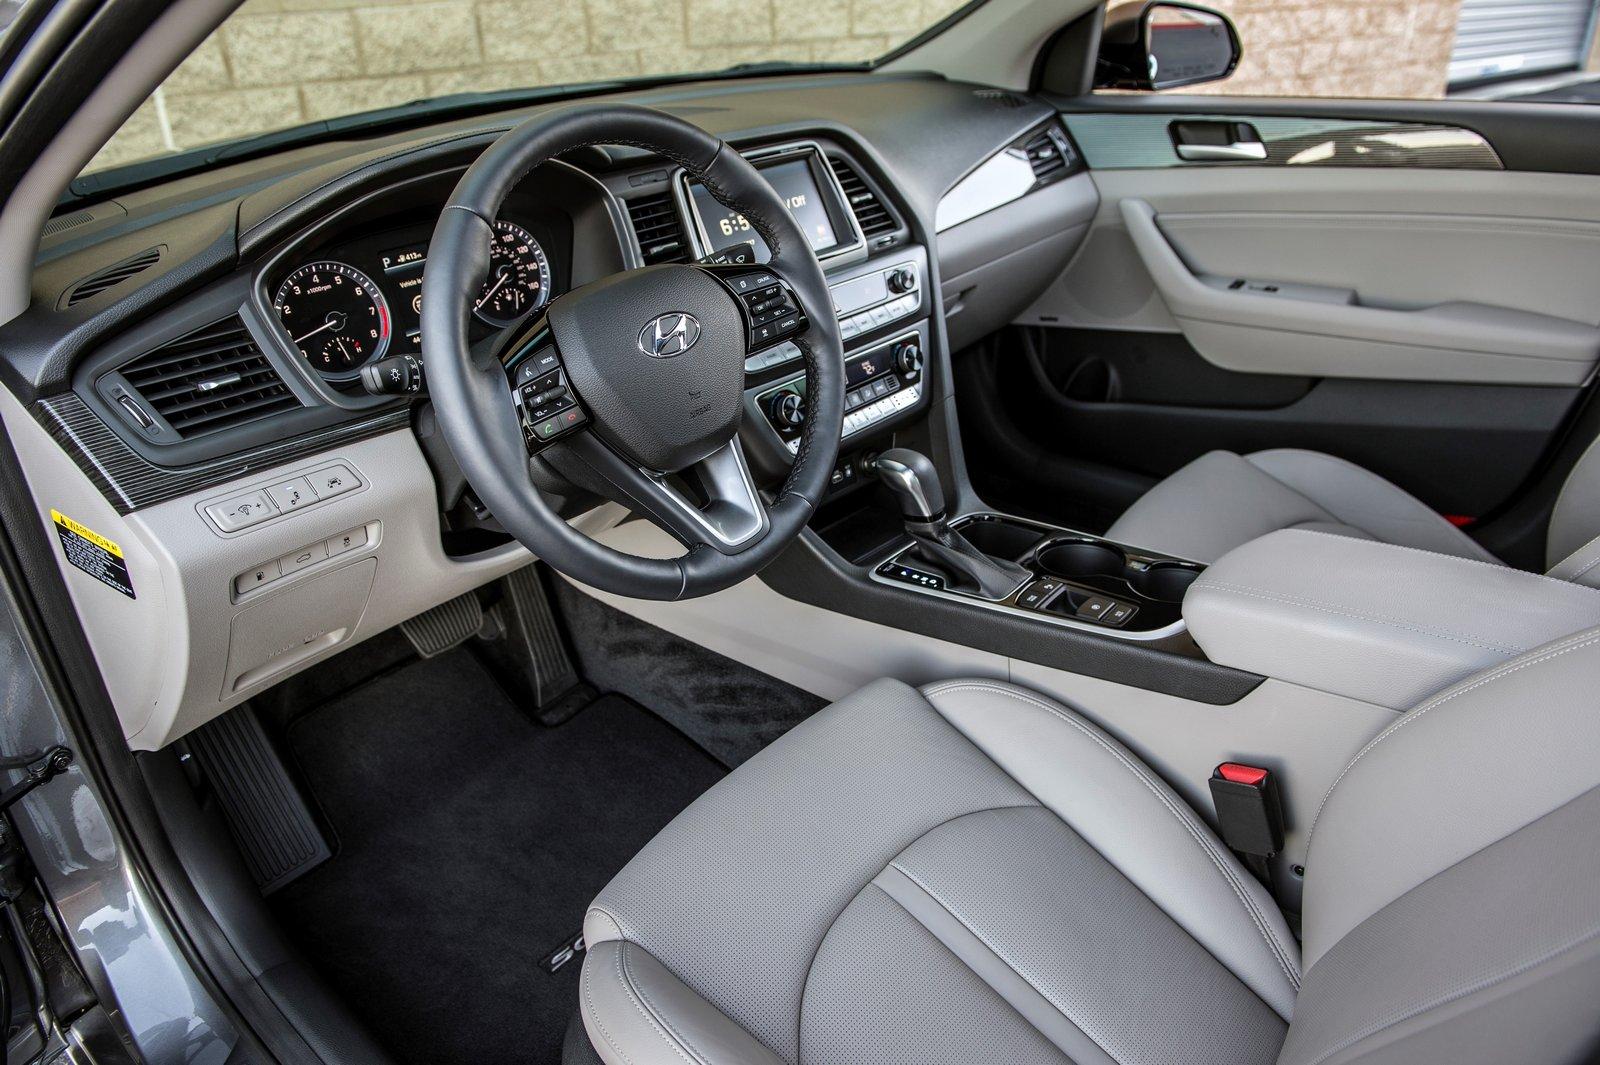 2017 Hyundai Sonata Eco >> Refreshed 2018 Hyundai Sonata Starts at $22,050 - autoevolution